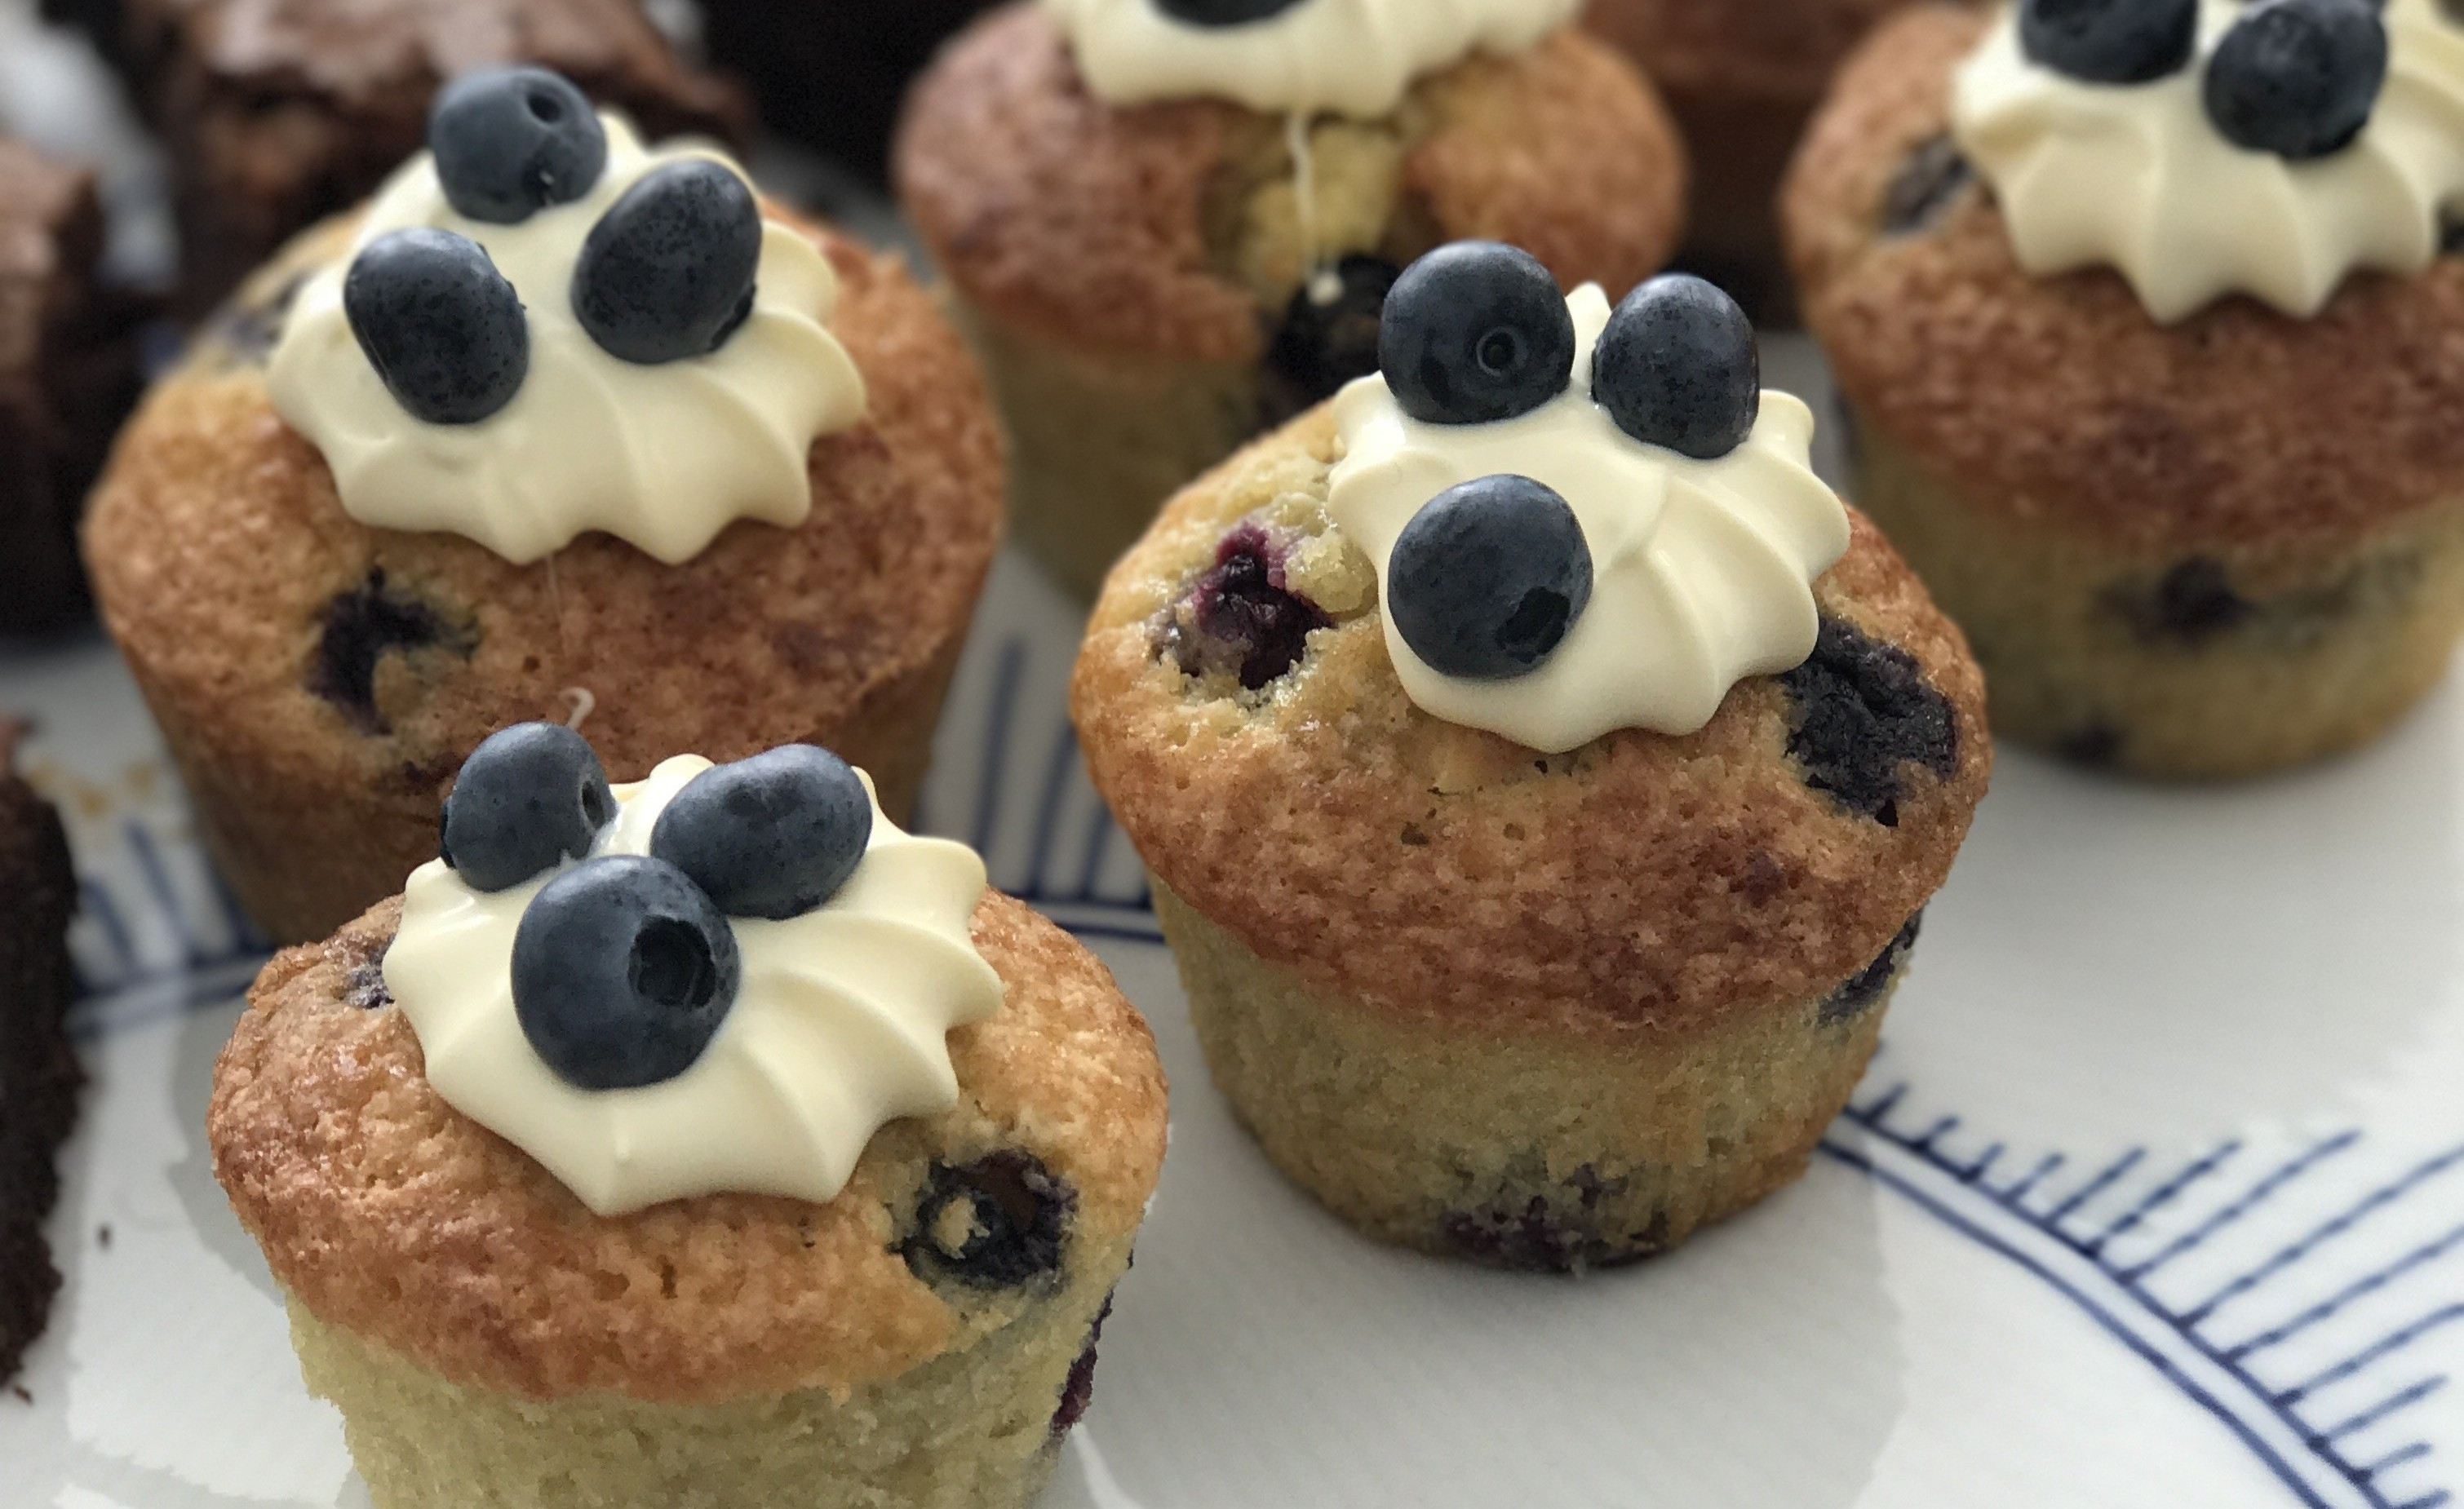 Blåbærmuffins med kokos og marcipan